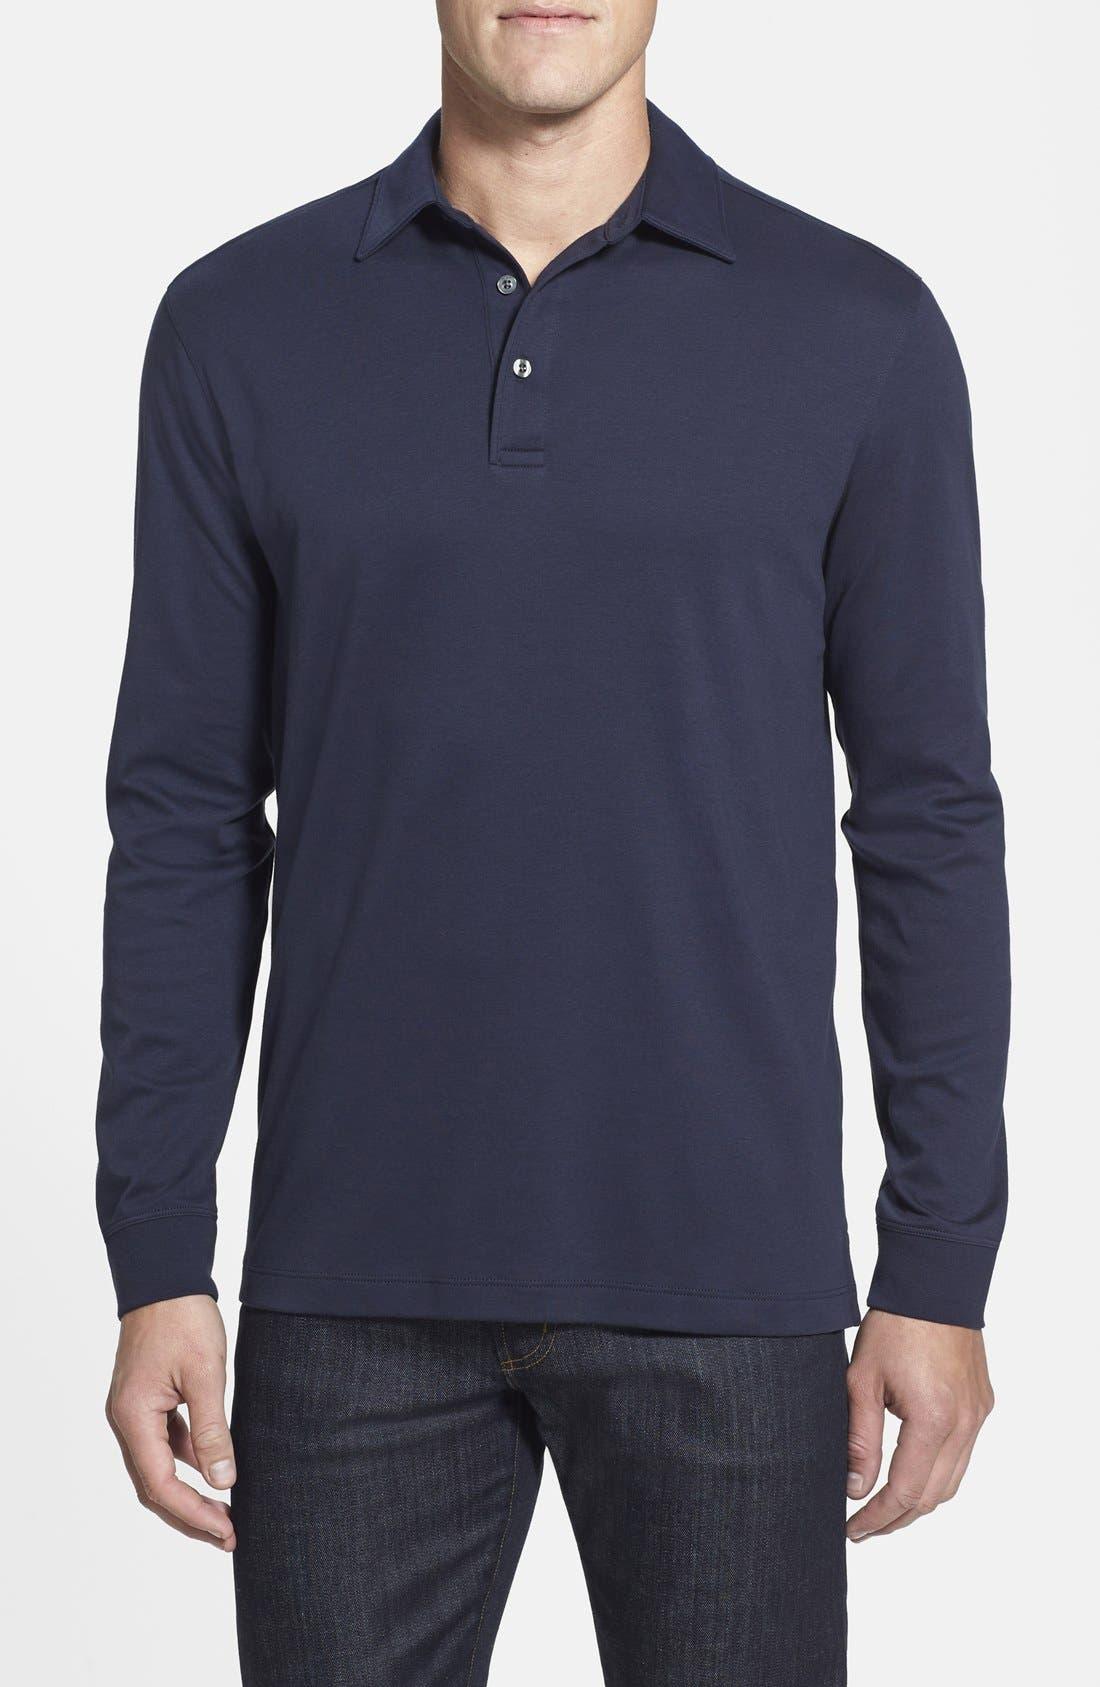 Reebok Polo Shirts Womens Purple Cheap Off41 The Largest Catalog